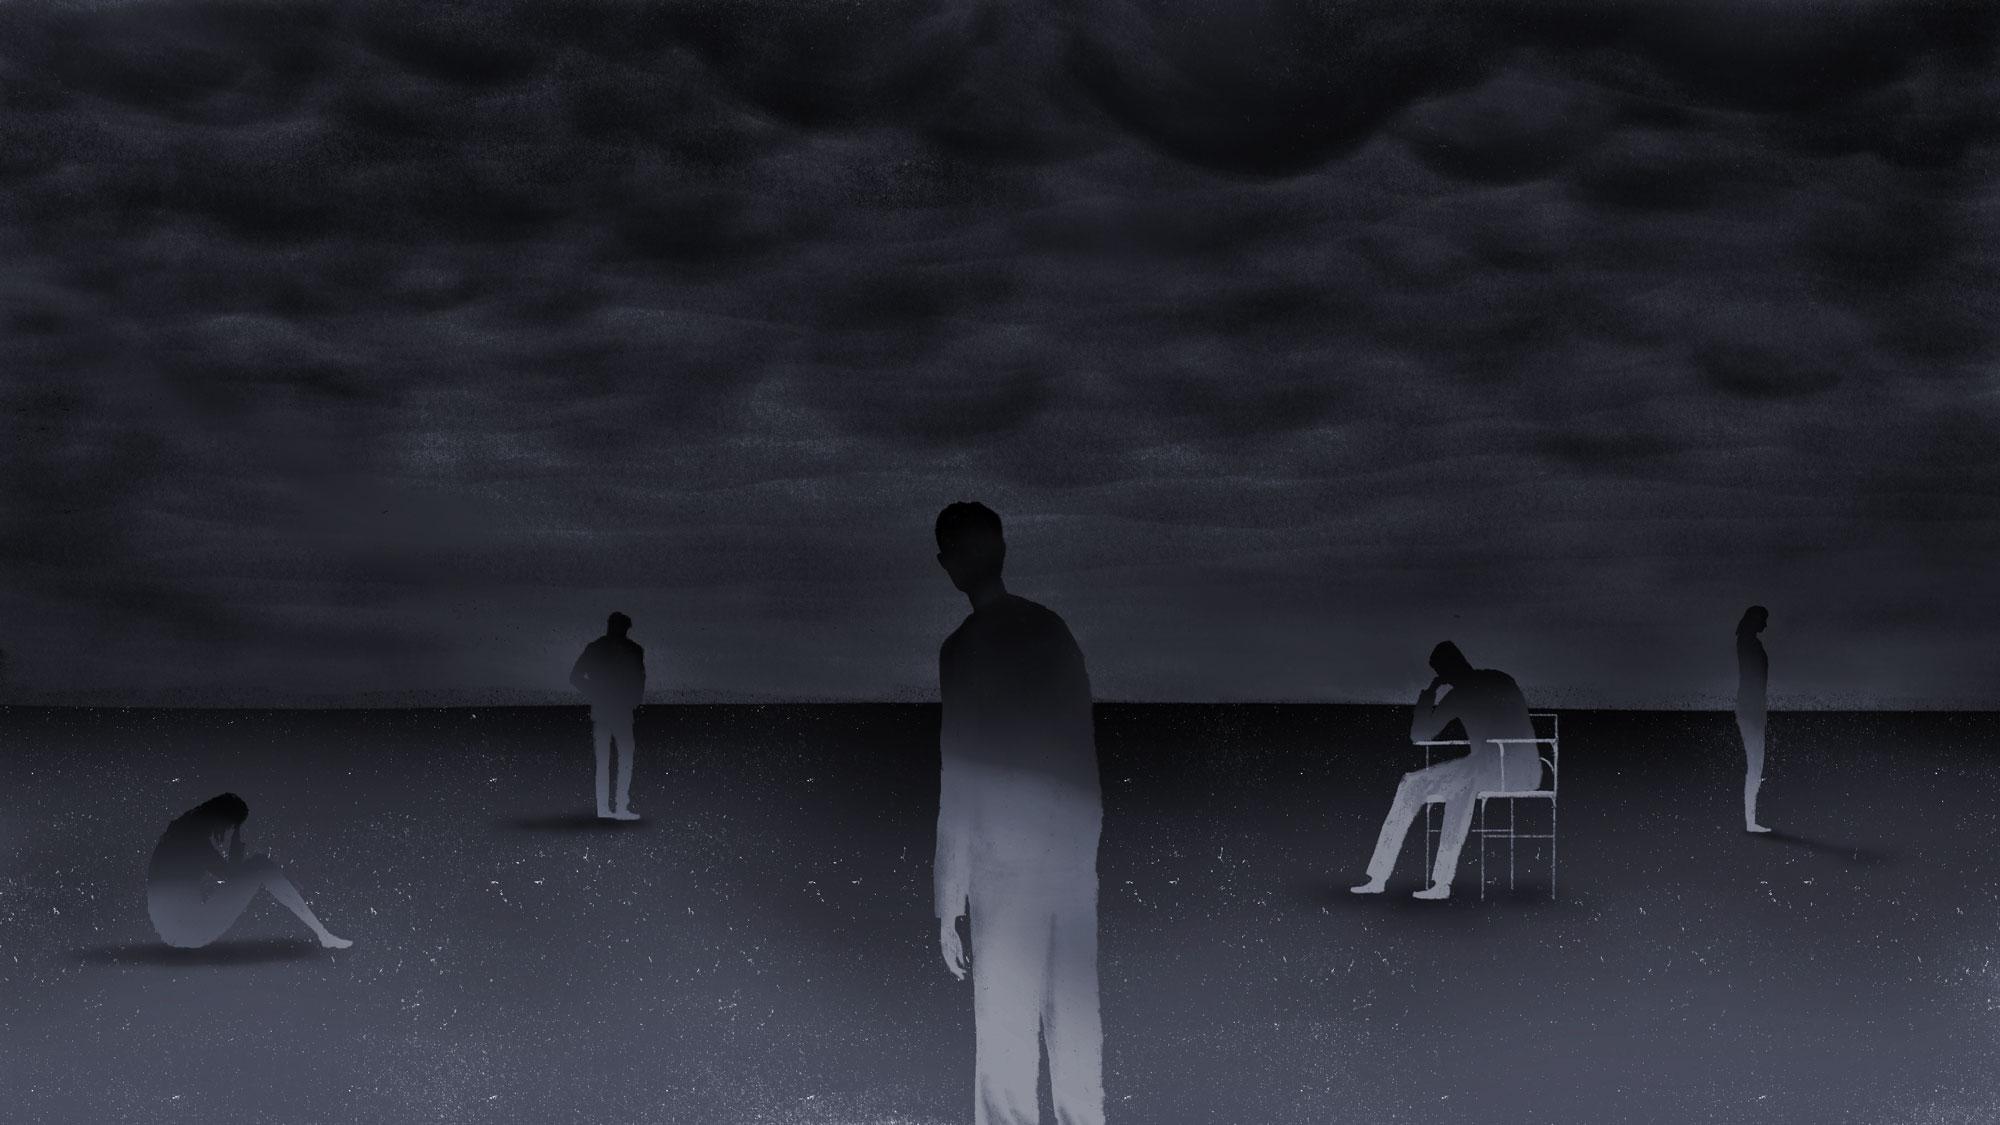 conceptual illustration showing 5 figures in a dark empty landscape